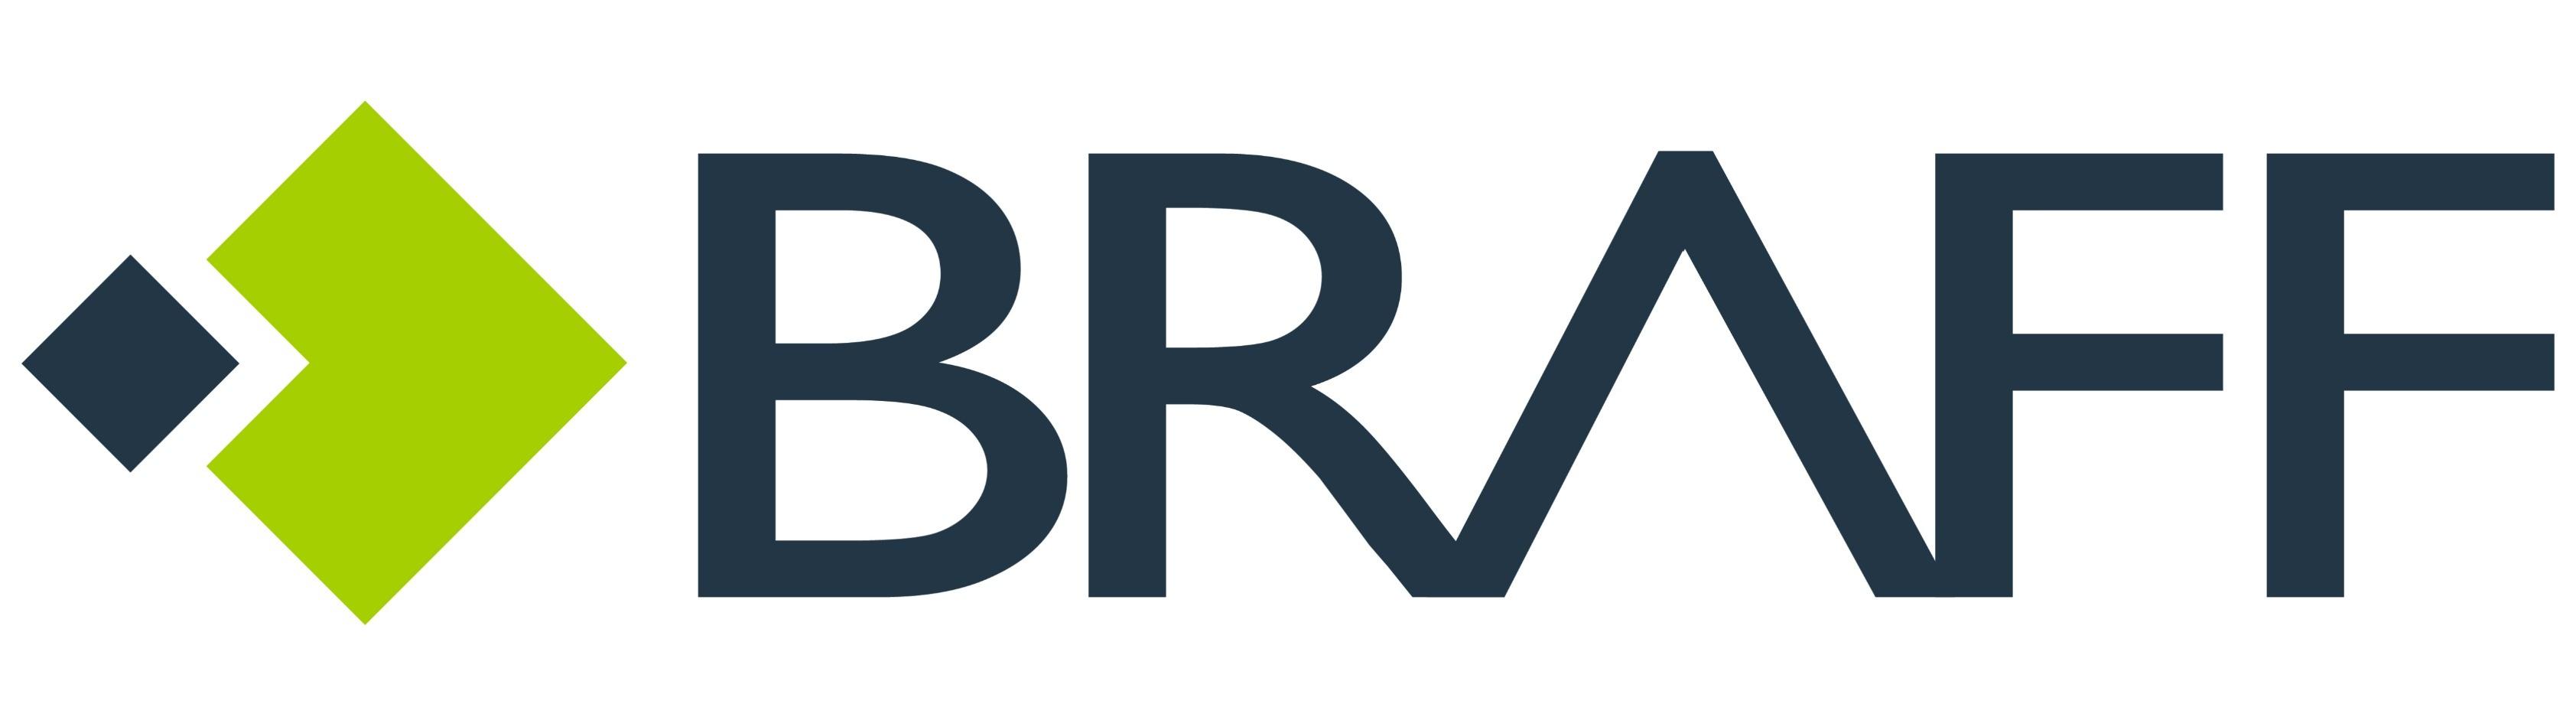 Braff-Logo-cropped.jpg